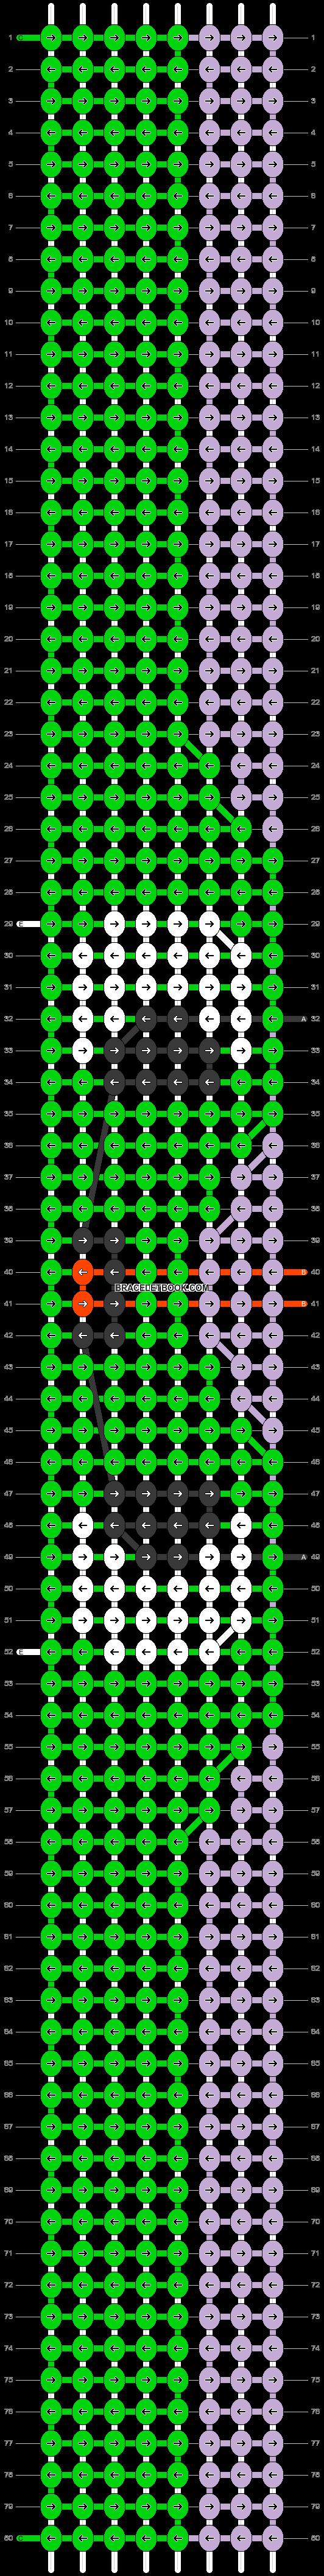 Alpha pattern #97348 pattern